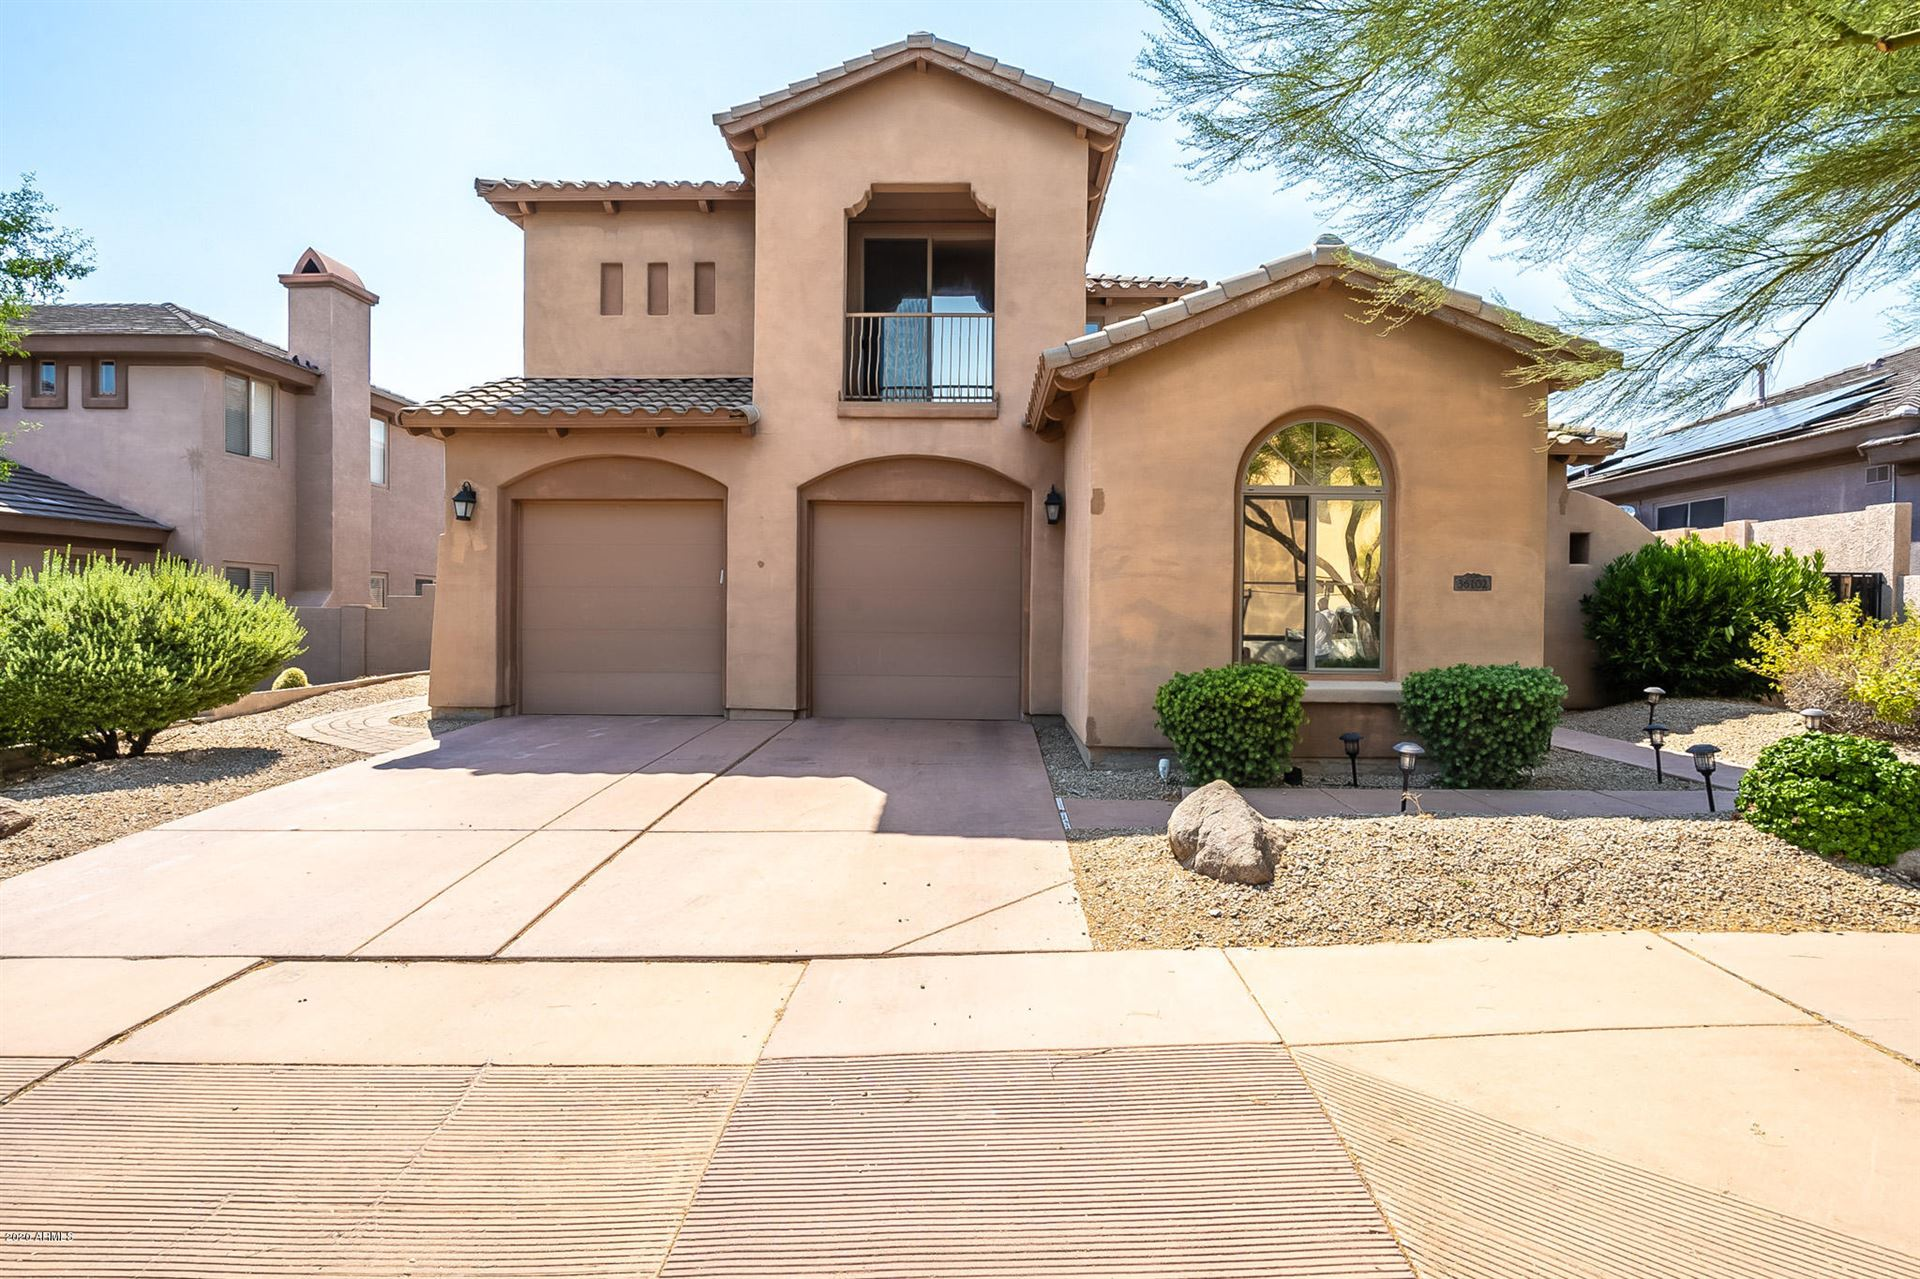 36102 N 30TH Avenue, Phoenix, AZ 85086 - MLS#: 6121254